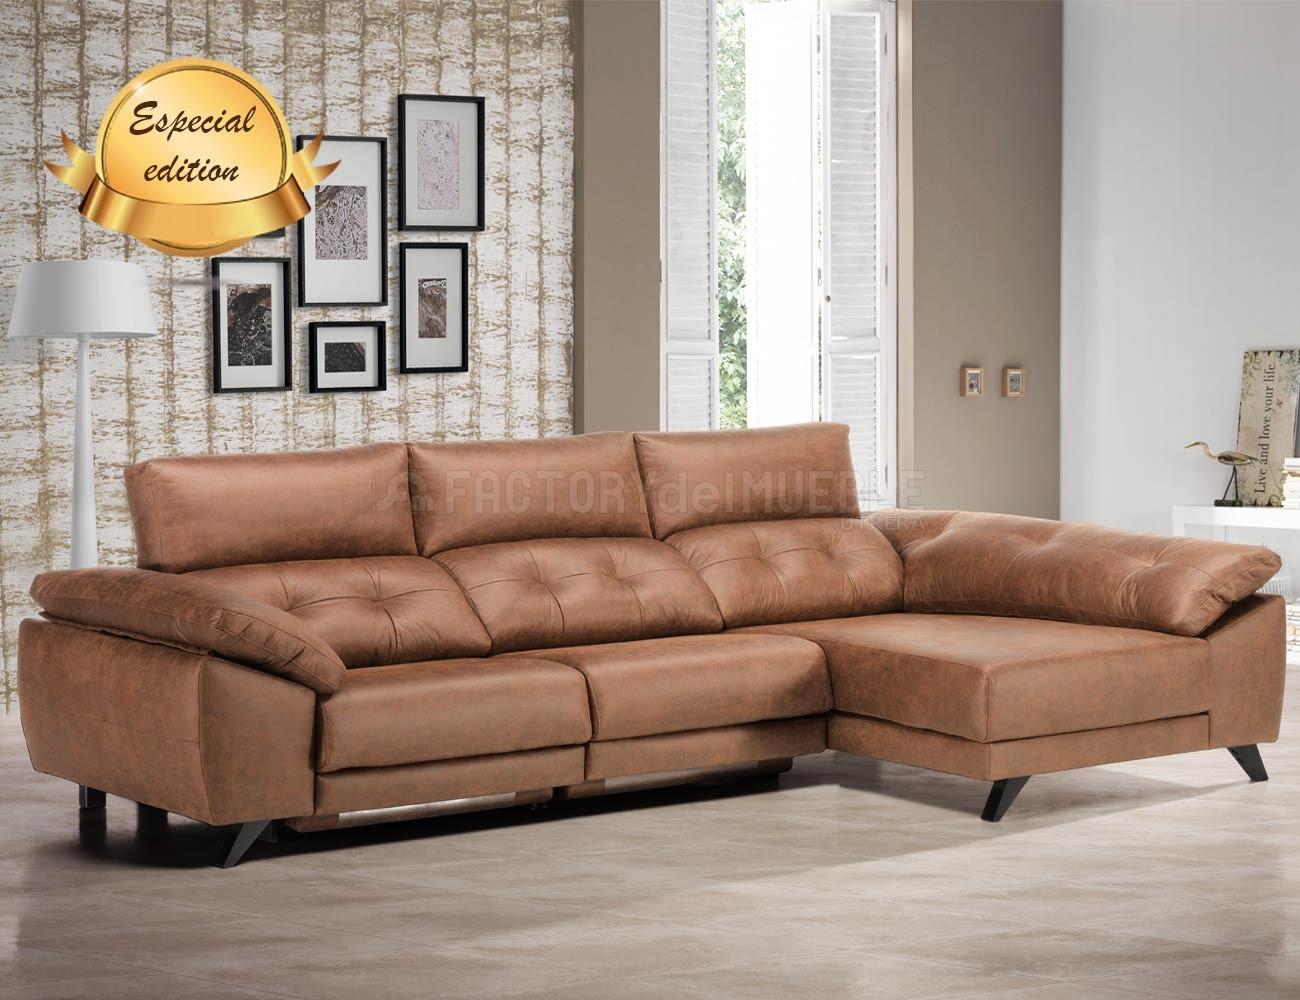 Sofa chaiselongue nemo